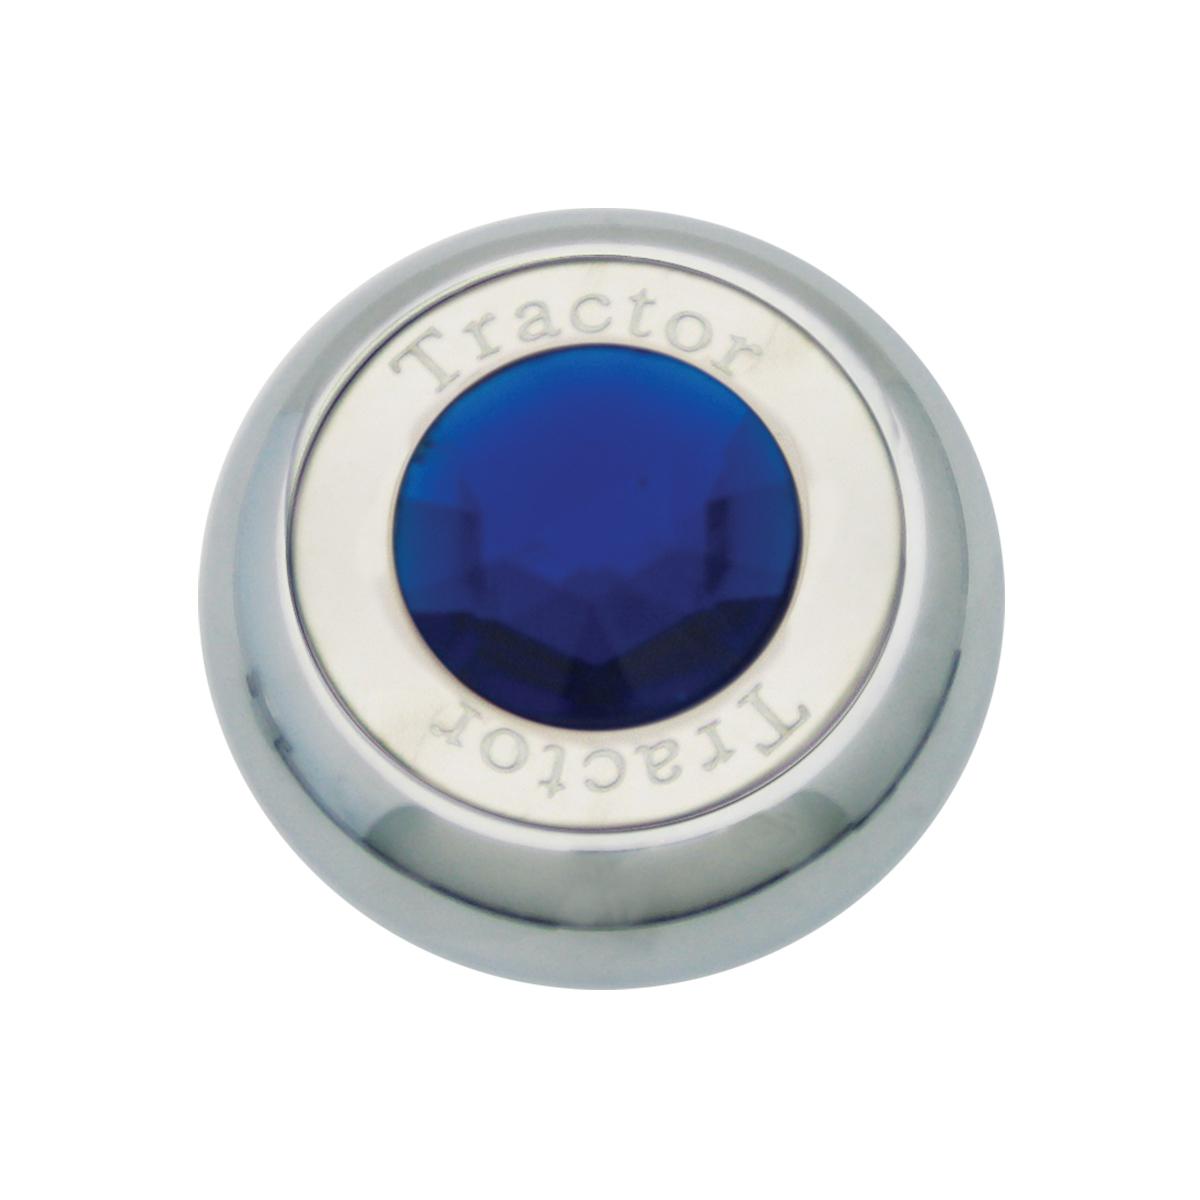 95371 Chrome Screw-In Air Valve Control Knob w/ Crystal